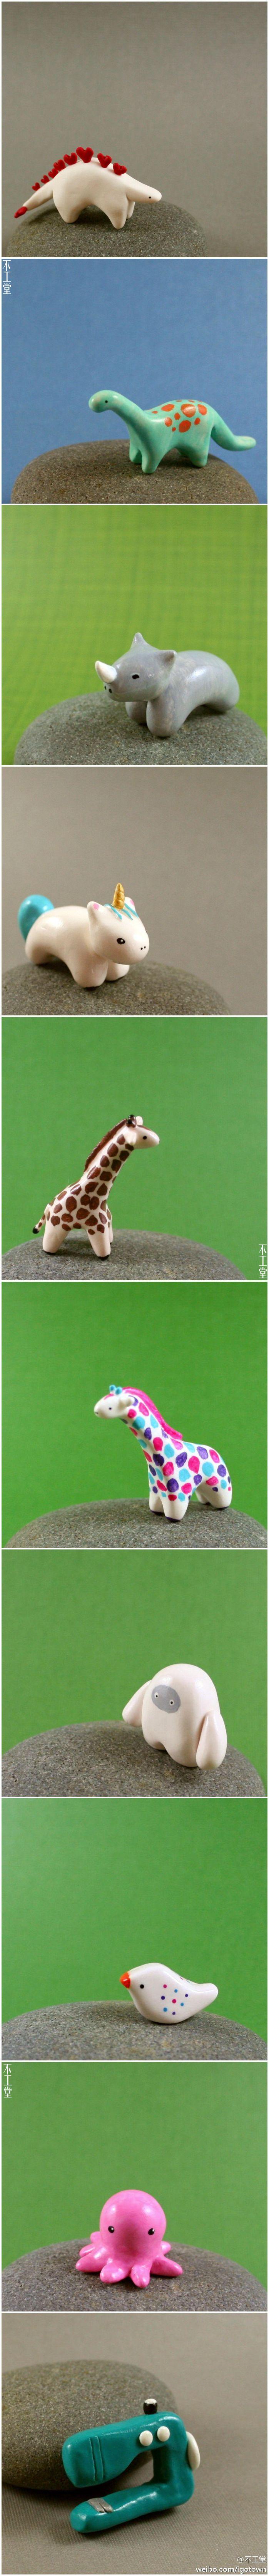 i like the stegosaurus, the dynosaurus below it and the multicolored giraffe